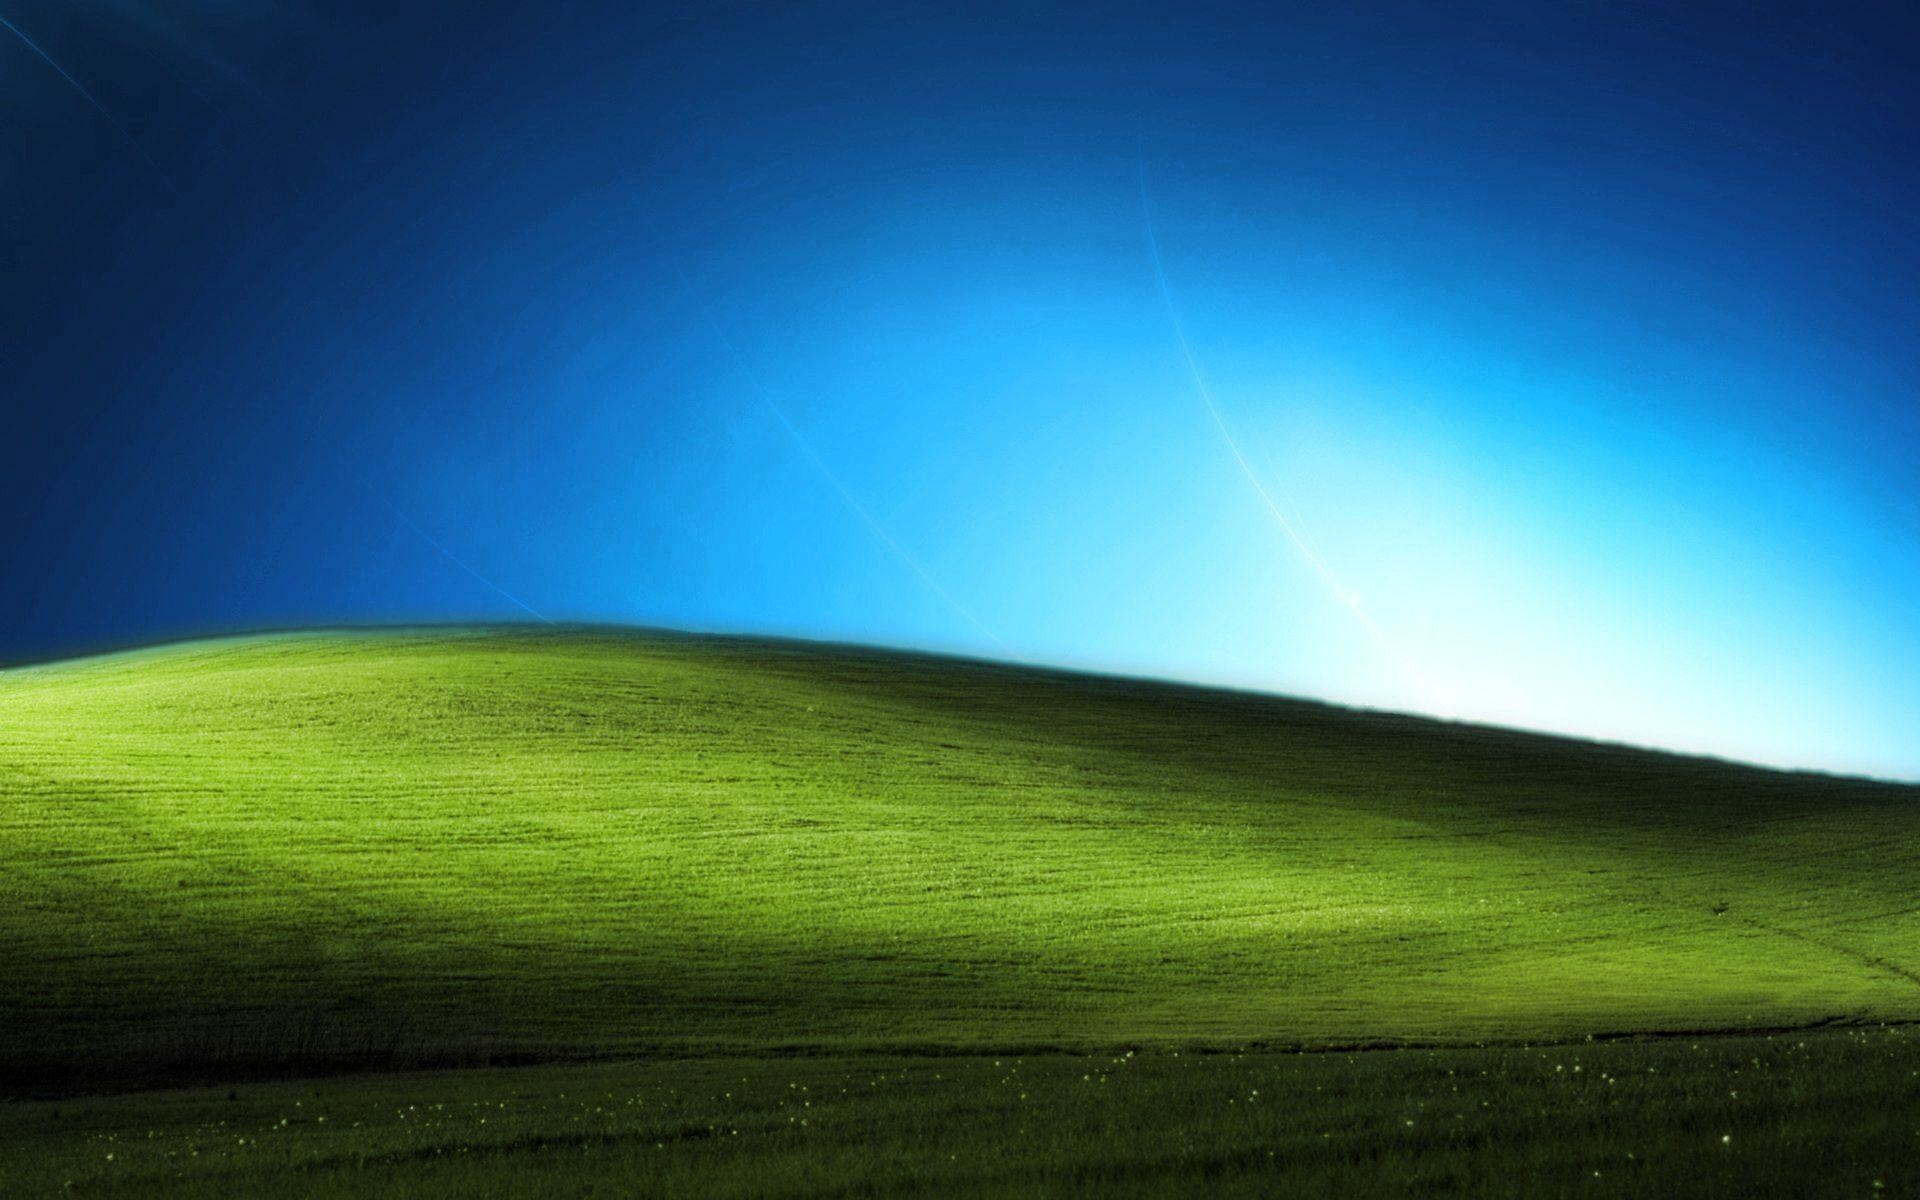 Windows Xp Hd Wallpaper Wallpapertag